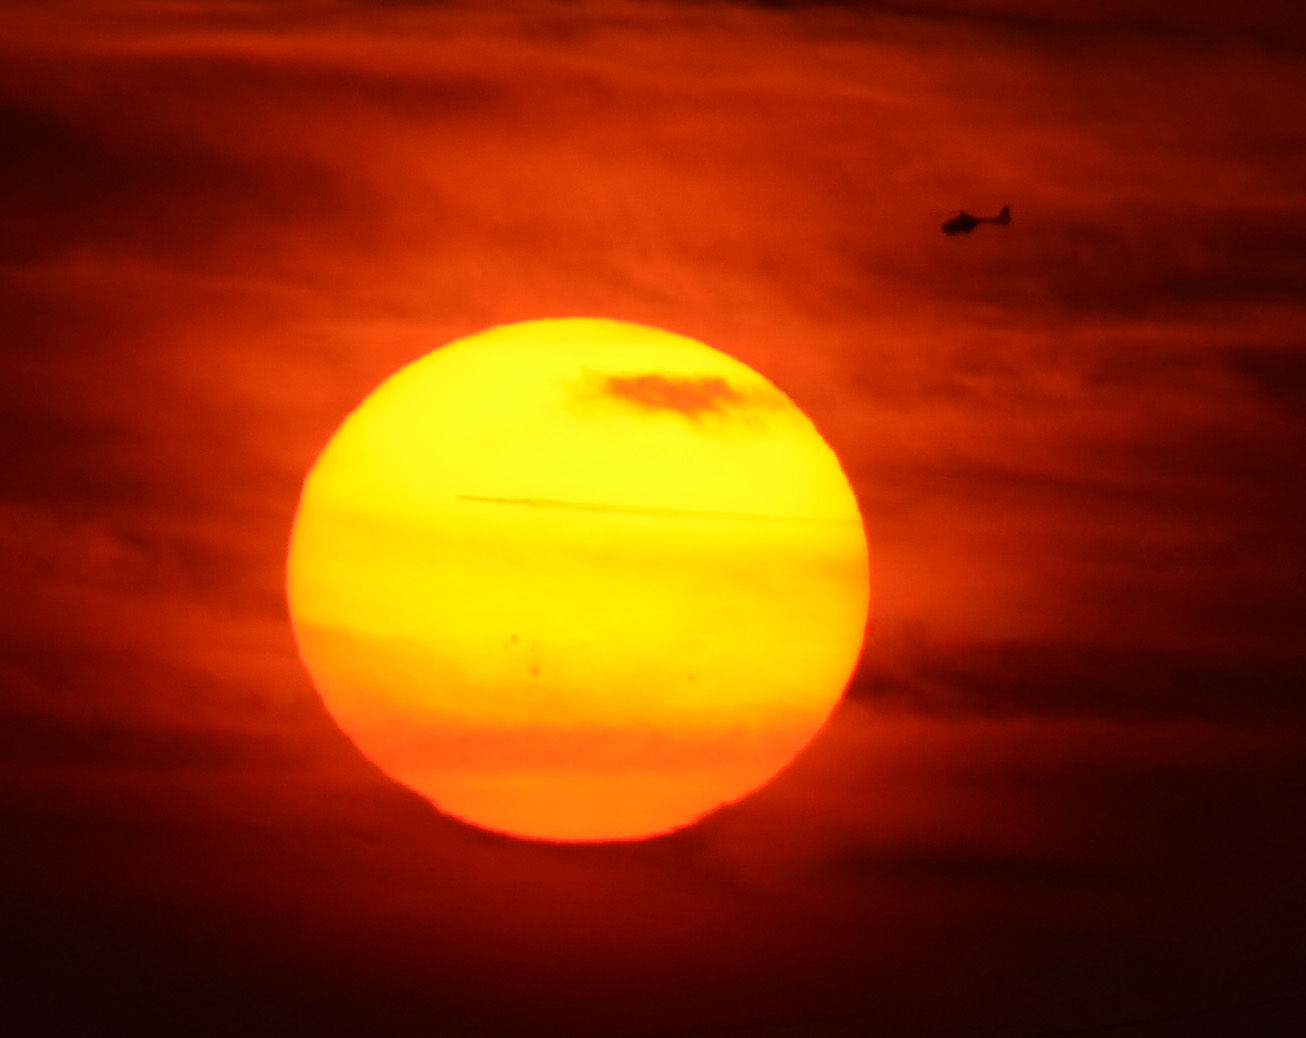 Si un rayo de luz pasa cerca de un objeto masivo, como una estrella...